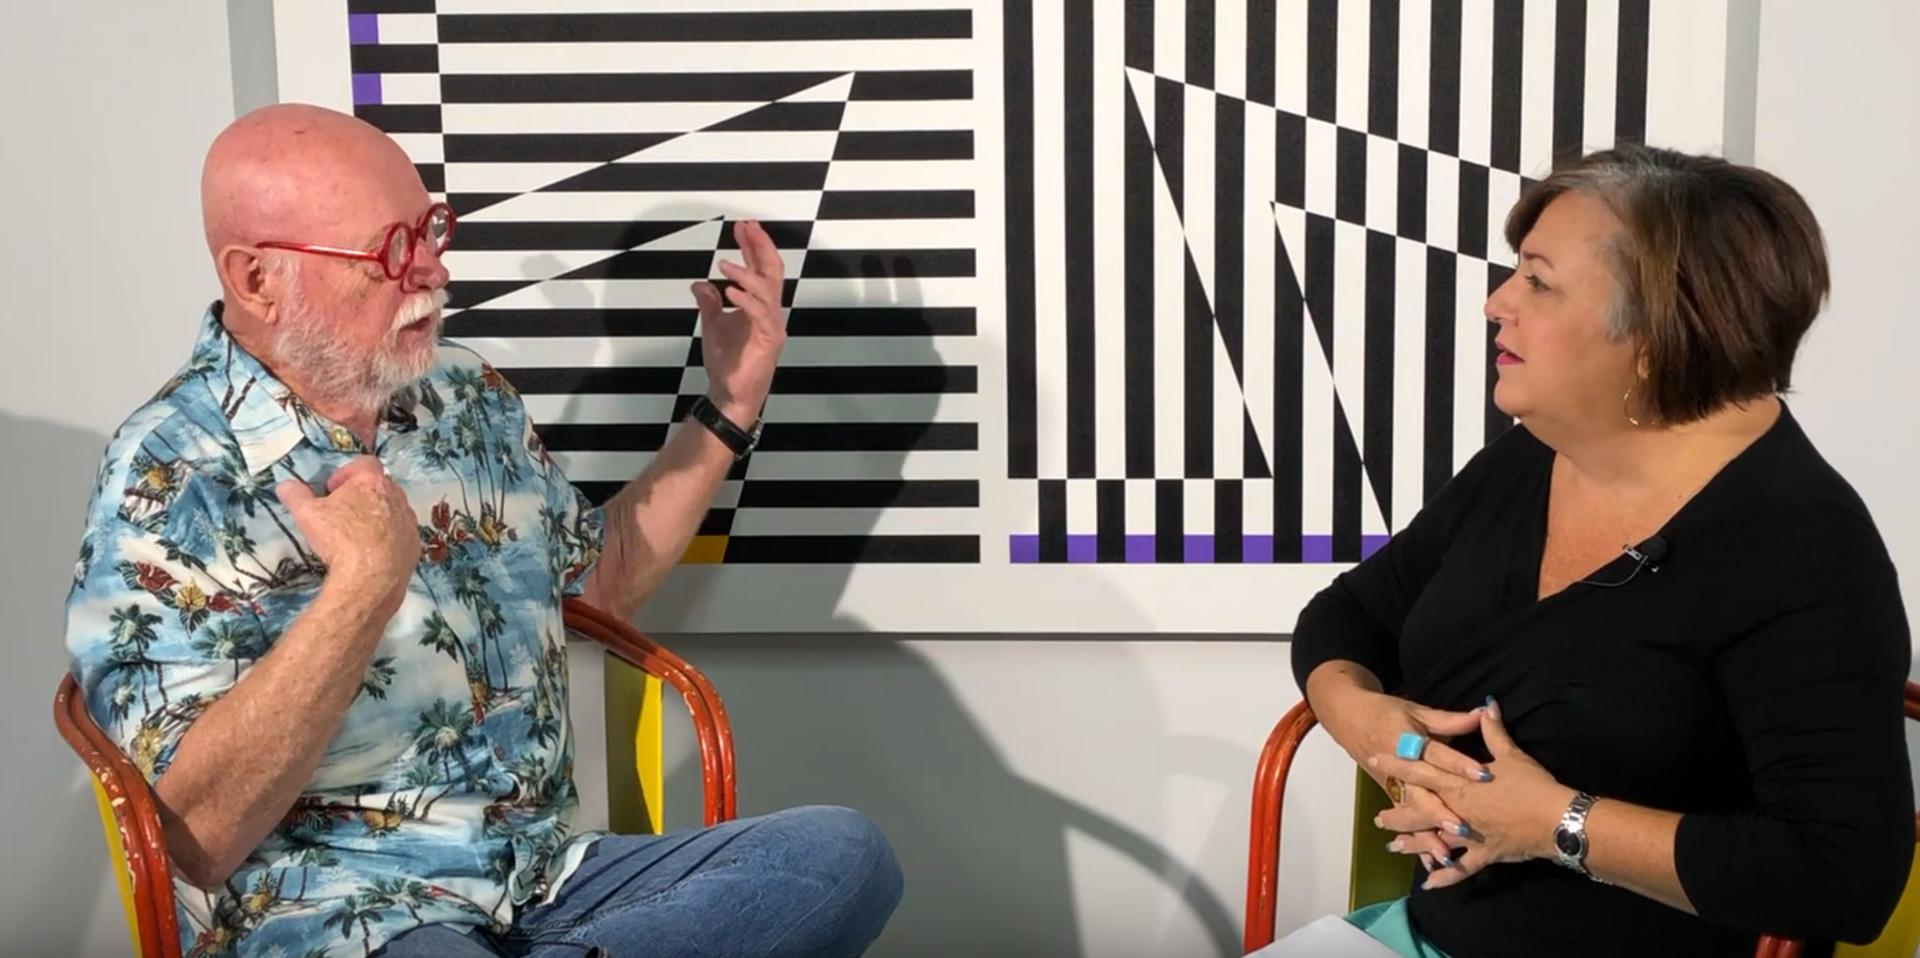 Gary Hinsche is interviewed at art exhibition